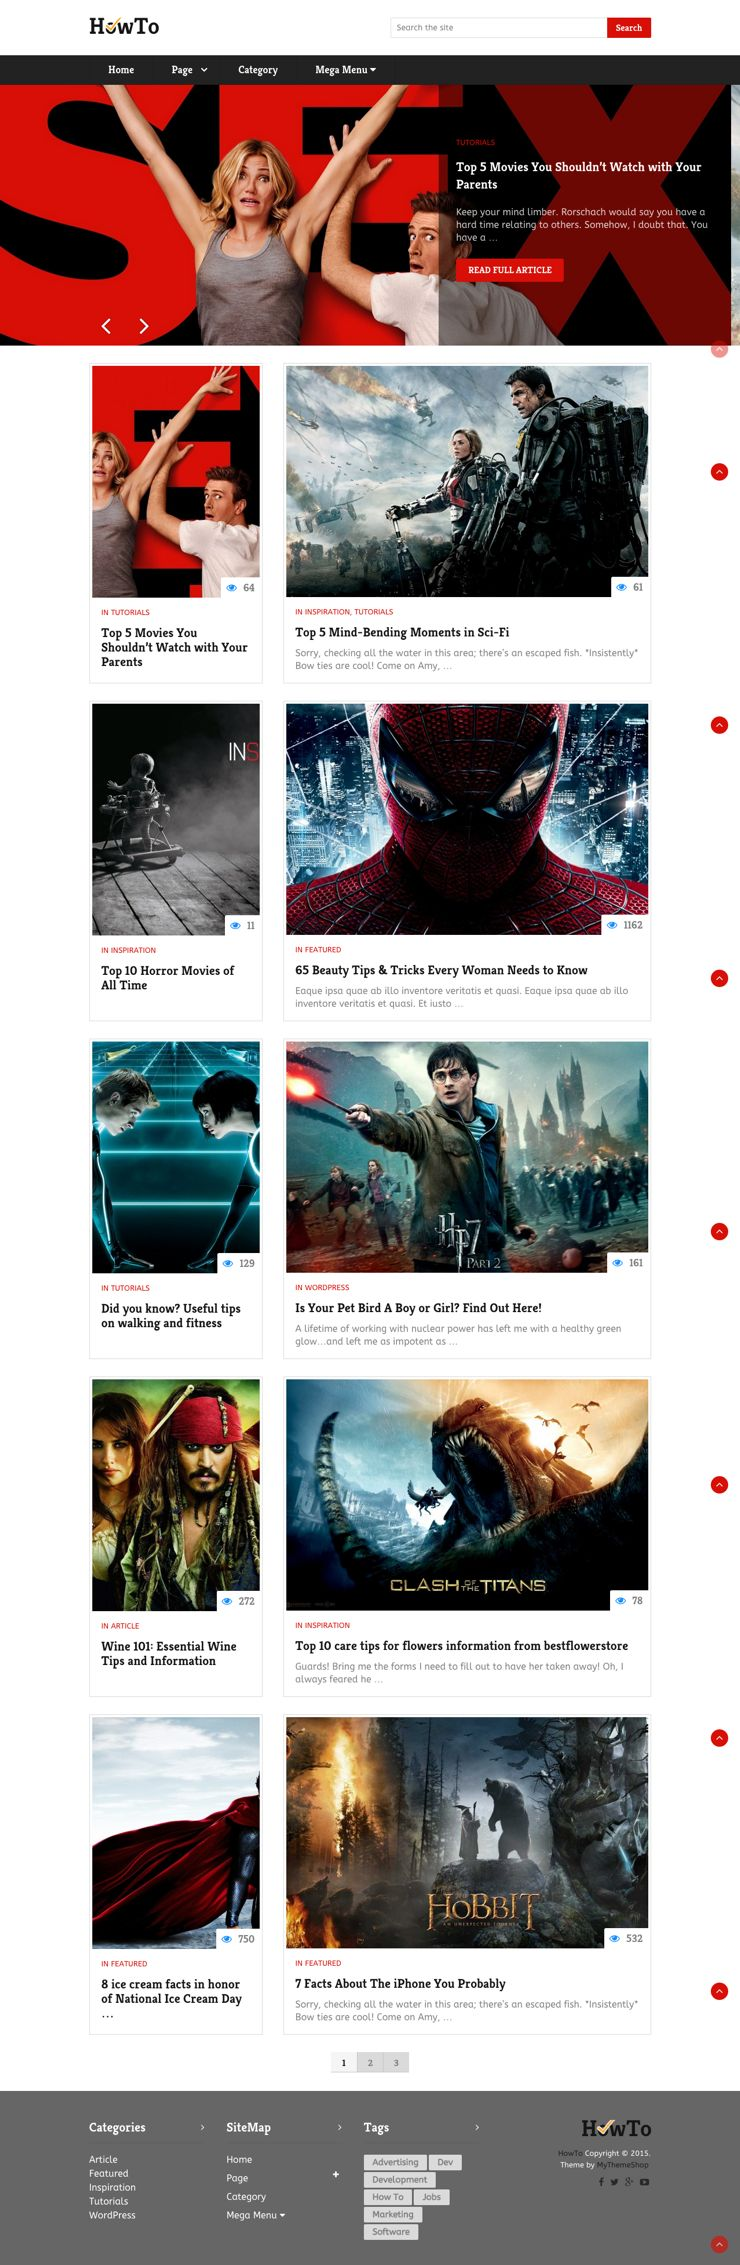 HowTo WordPress Content Heavy Blogs Theme